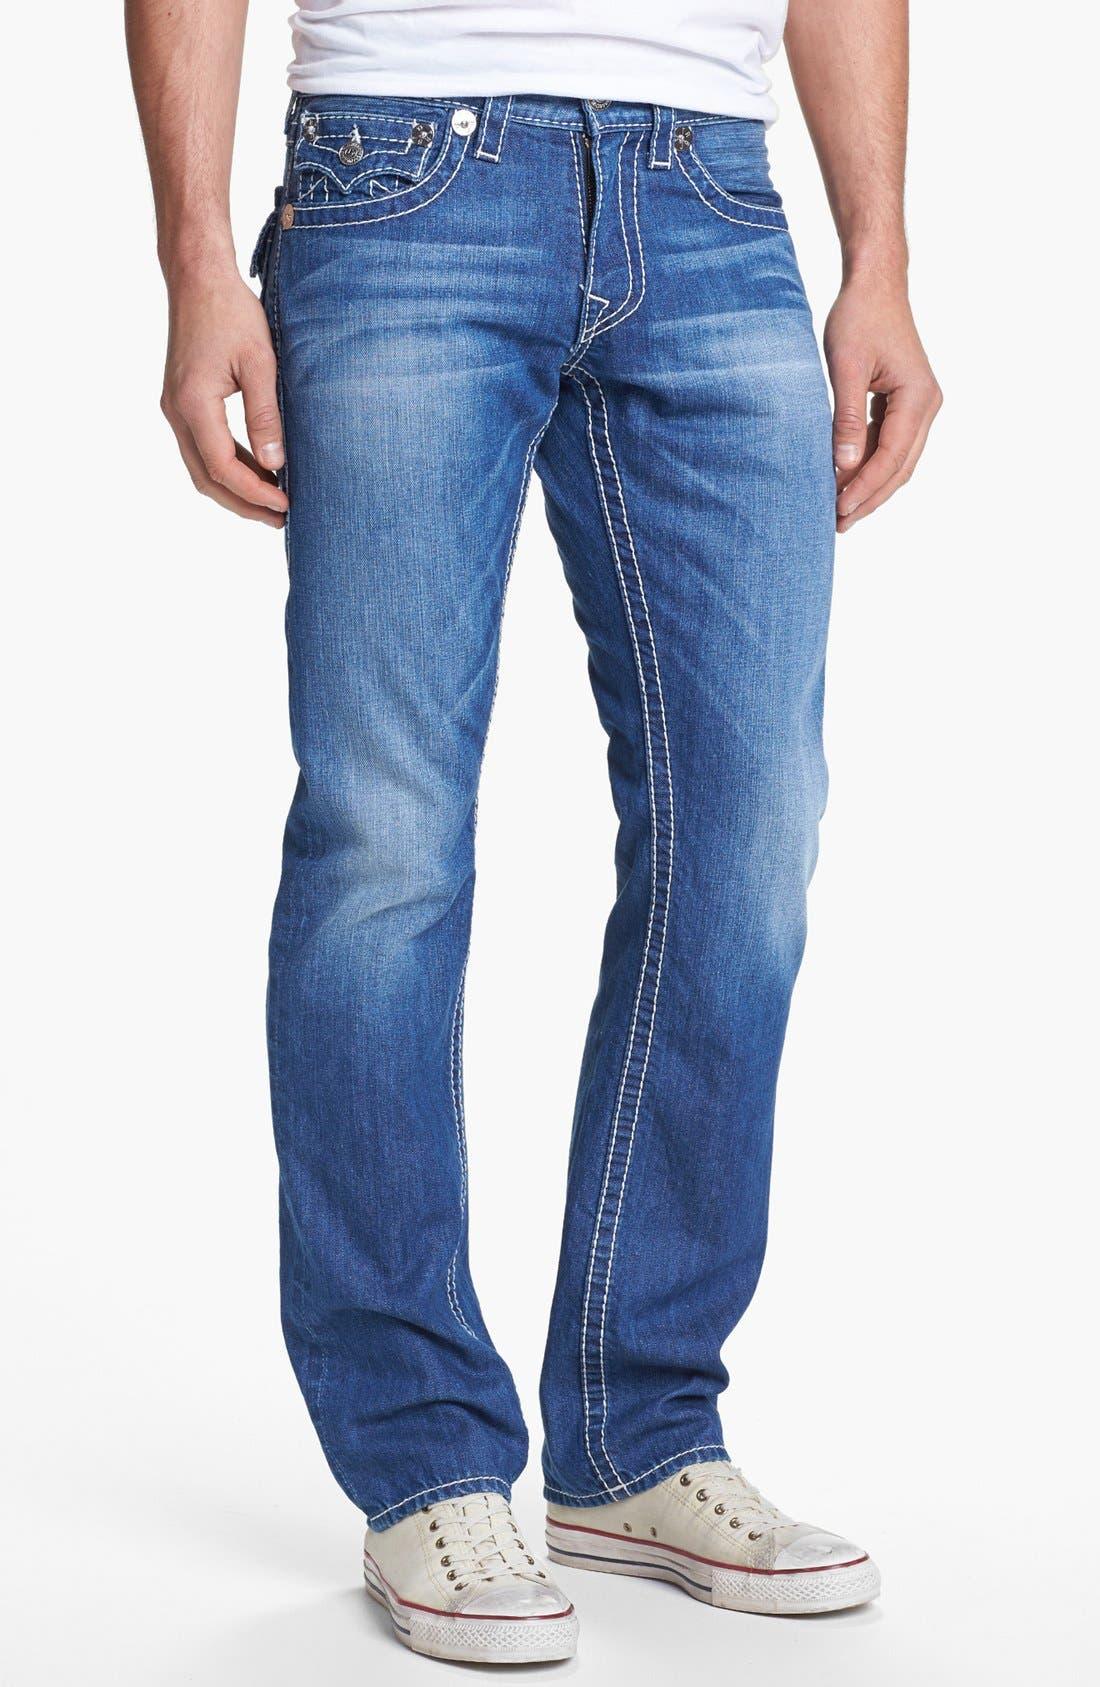 Alternate Image 2  - True Religion Brand Jeans 'Ricky' Straight Leg Jeans (Voyager)